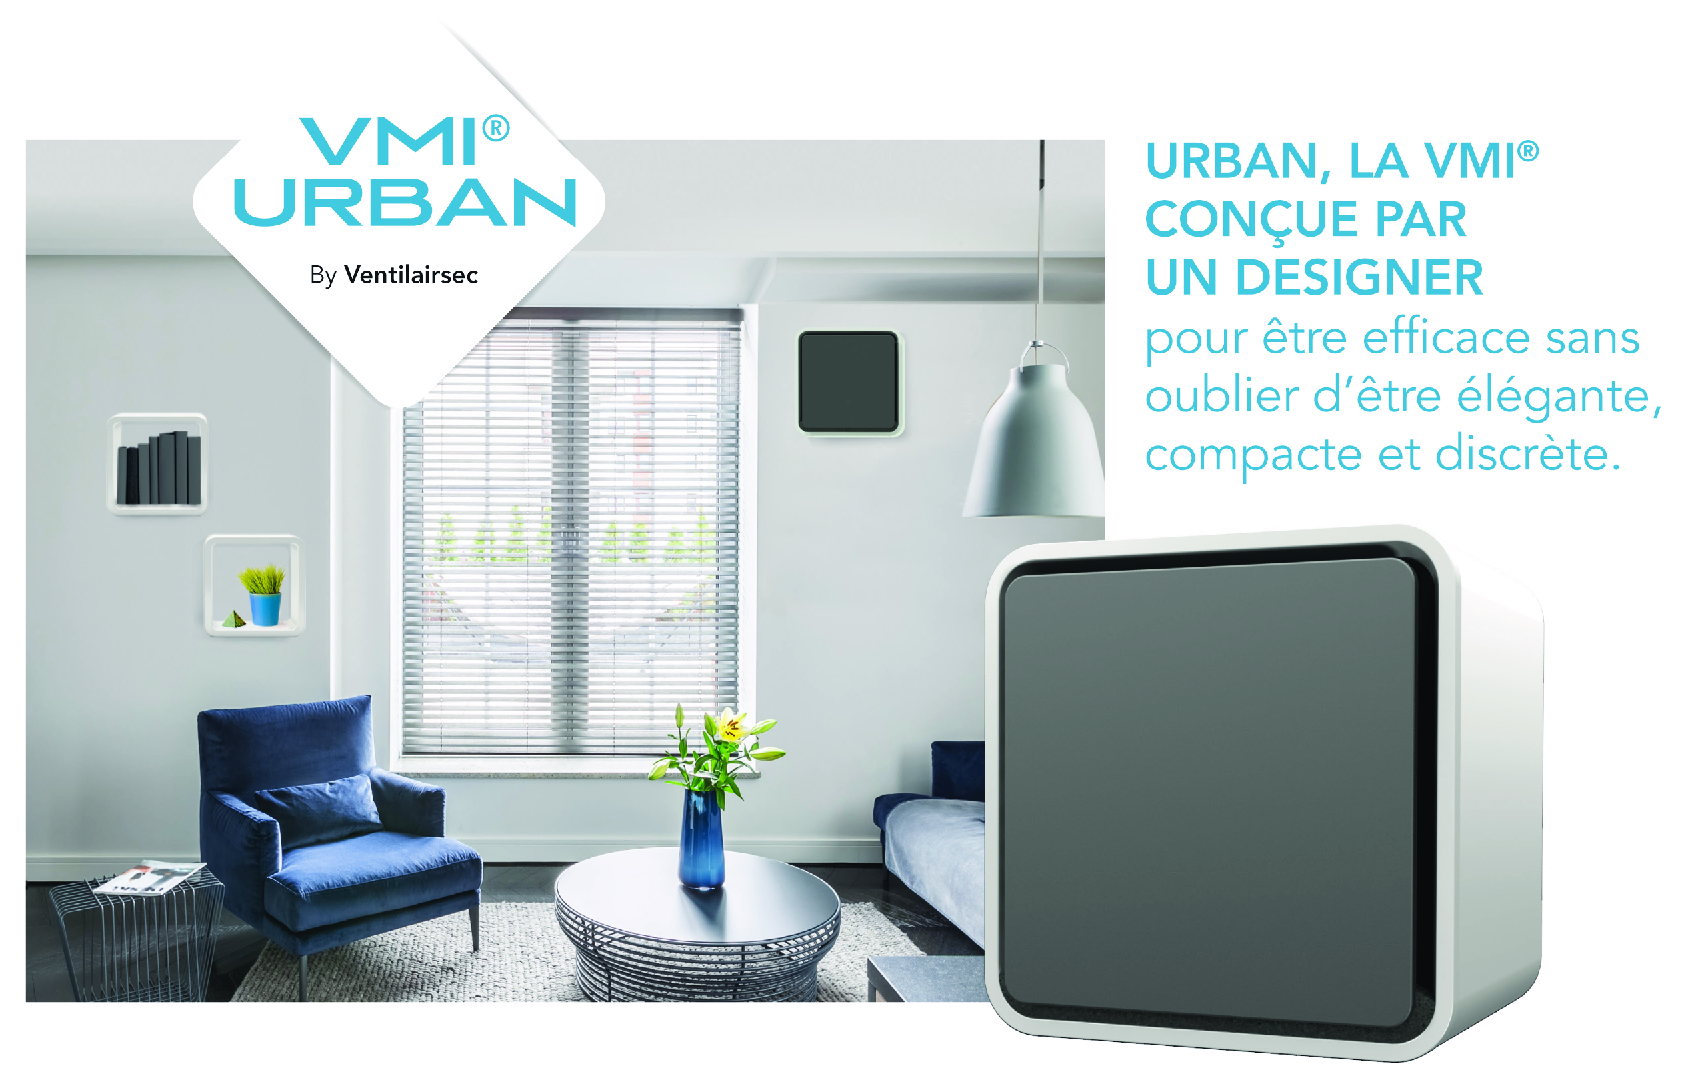 ventilation-insufflation-design-vmi-urban